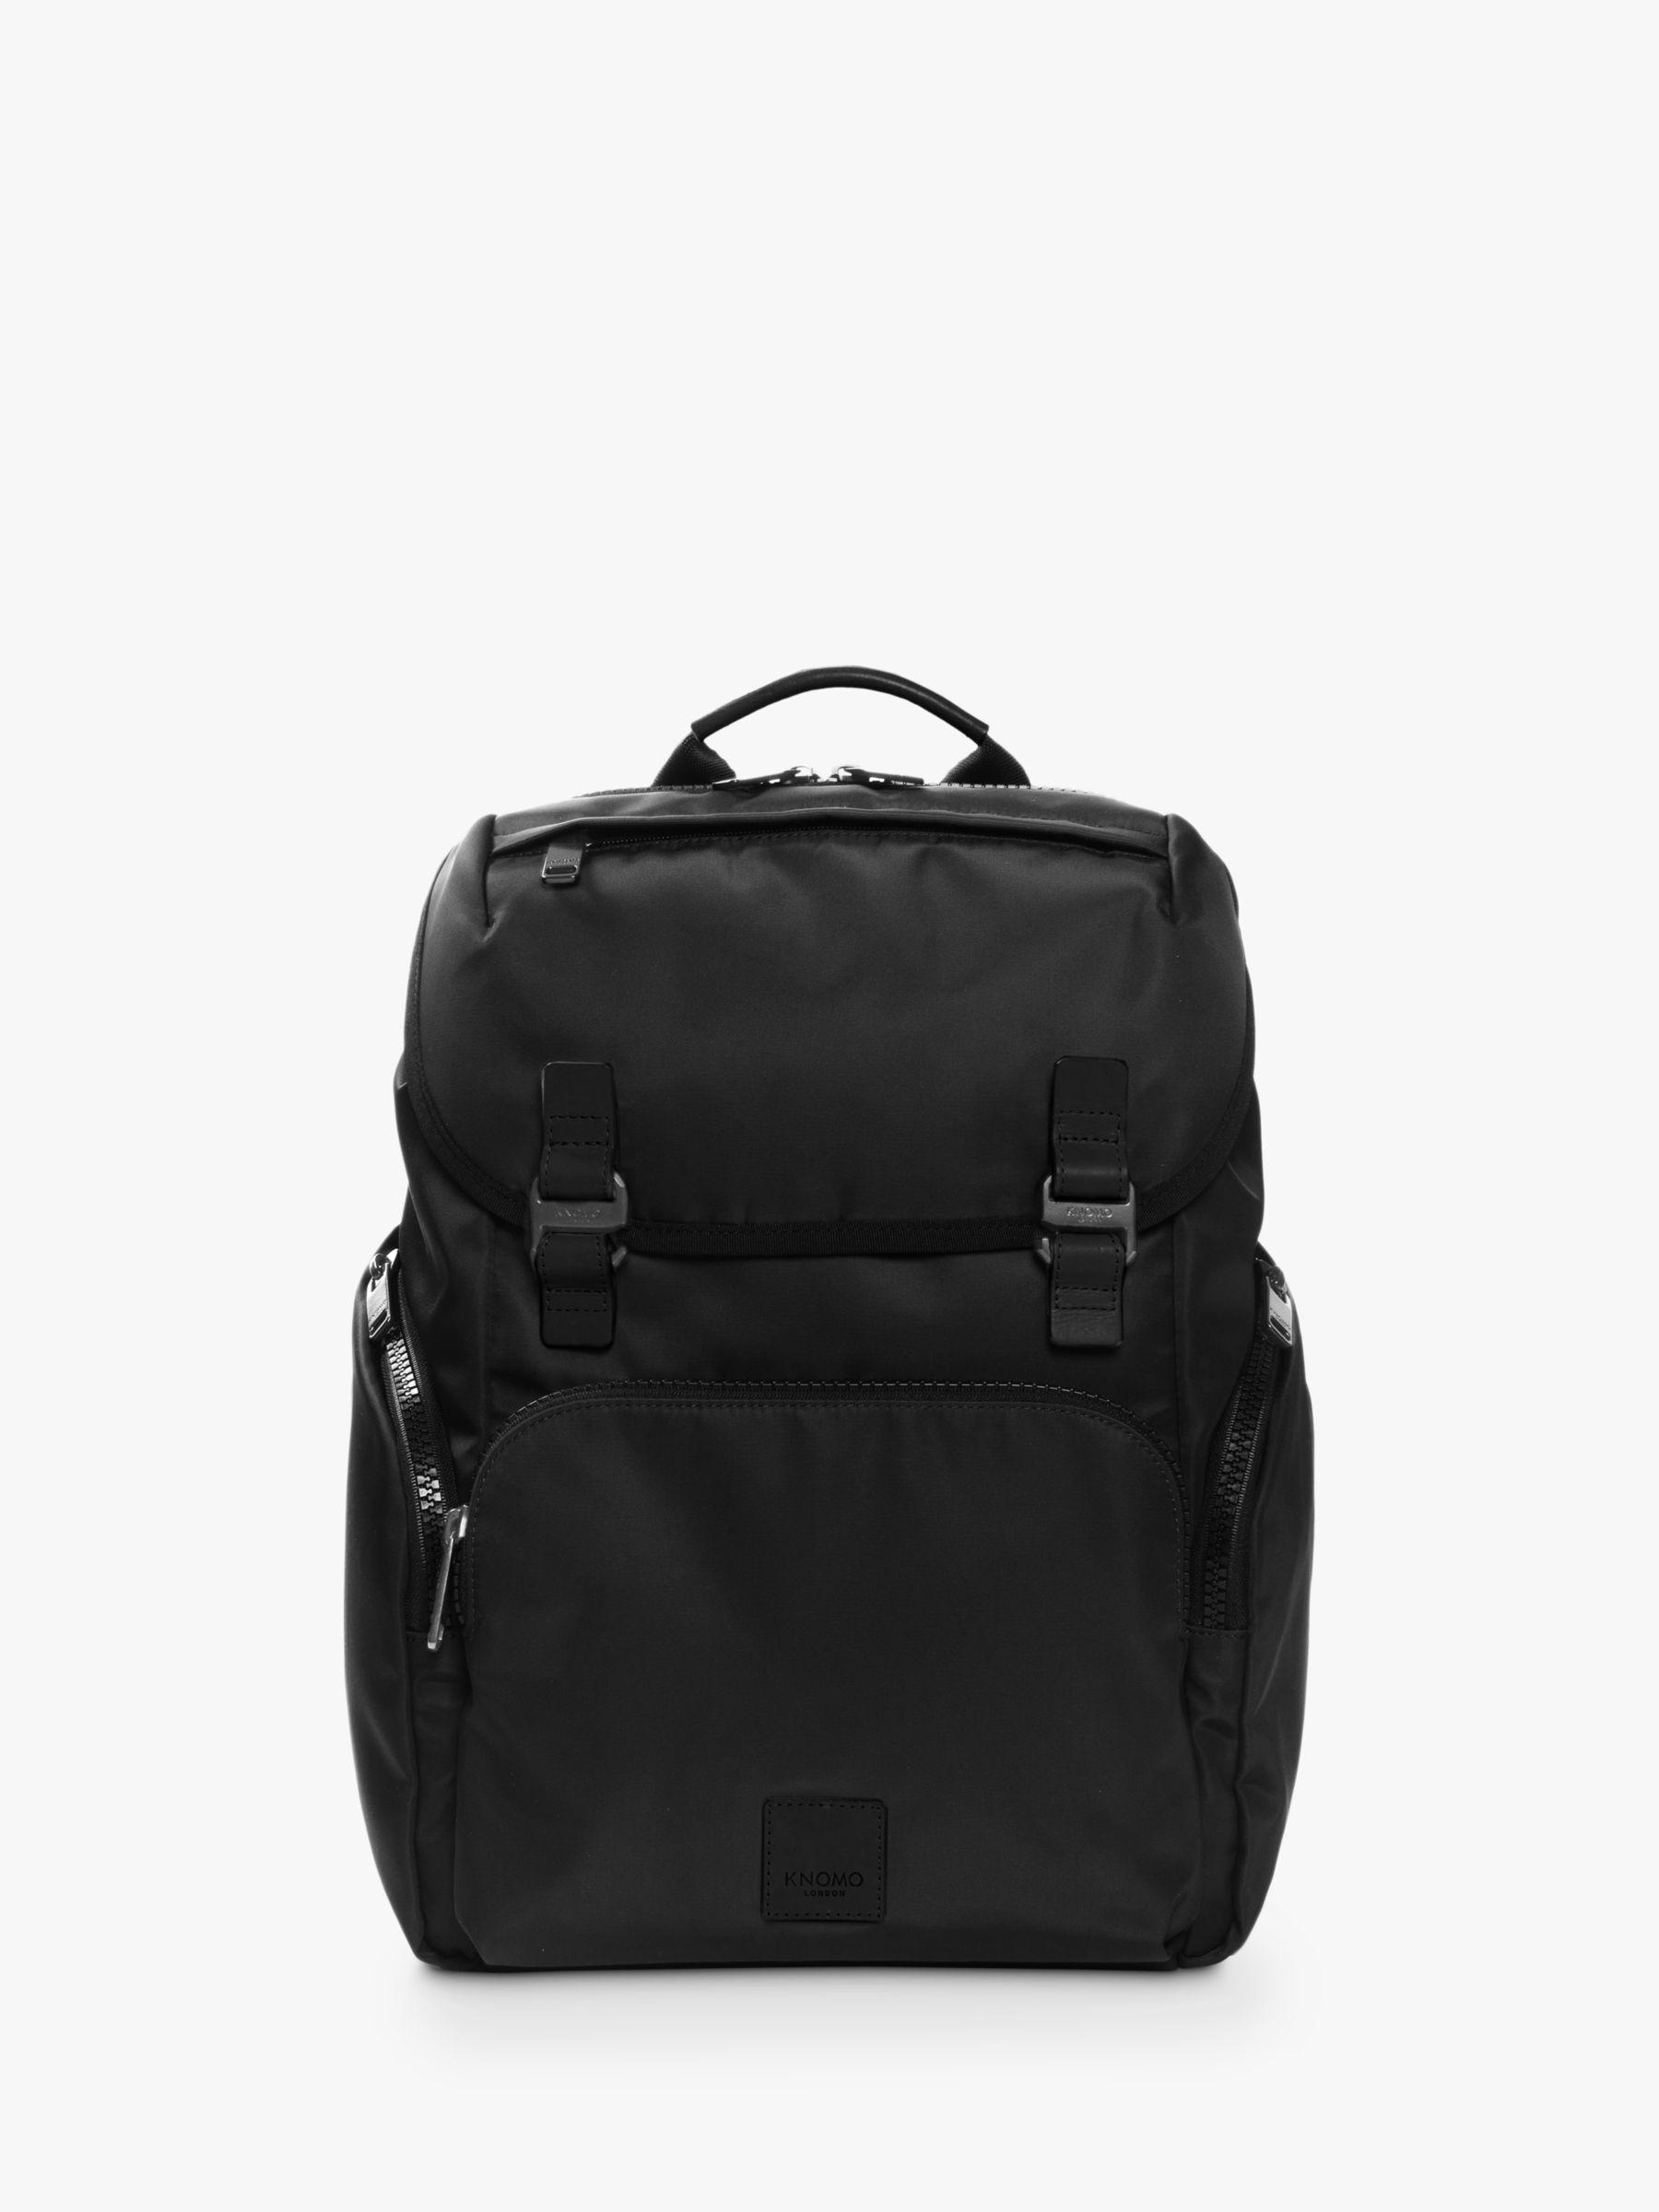 Knomo KNOMO Thurloe Backpack for Laptops up to 15, Black